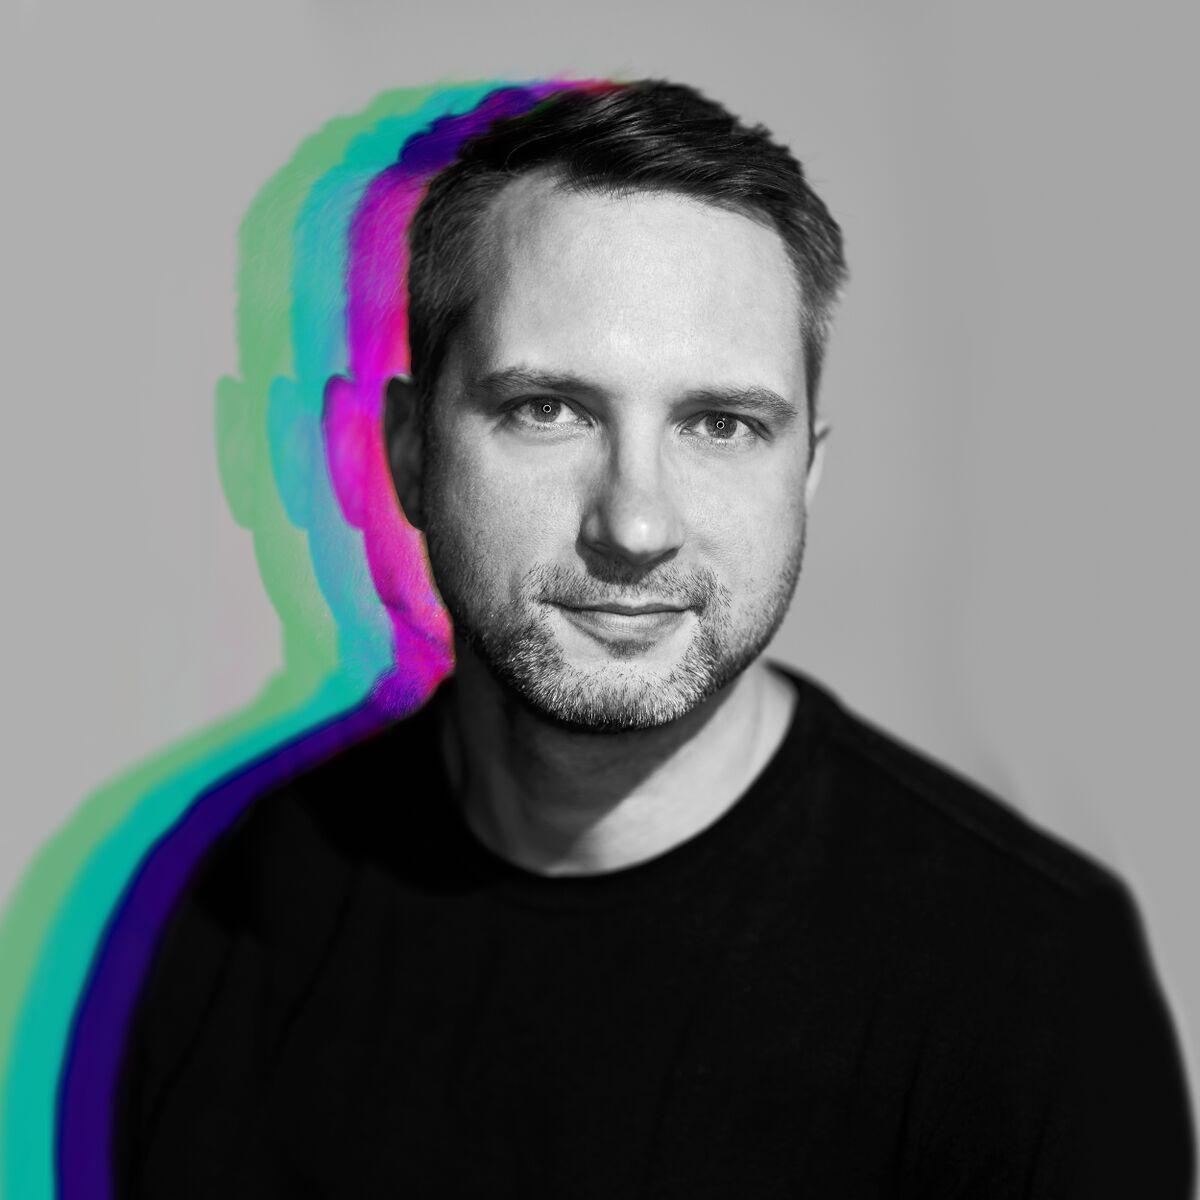 Brandon_Vevo_Profile_preview